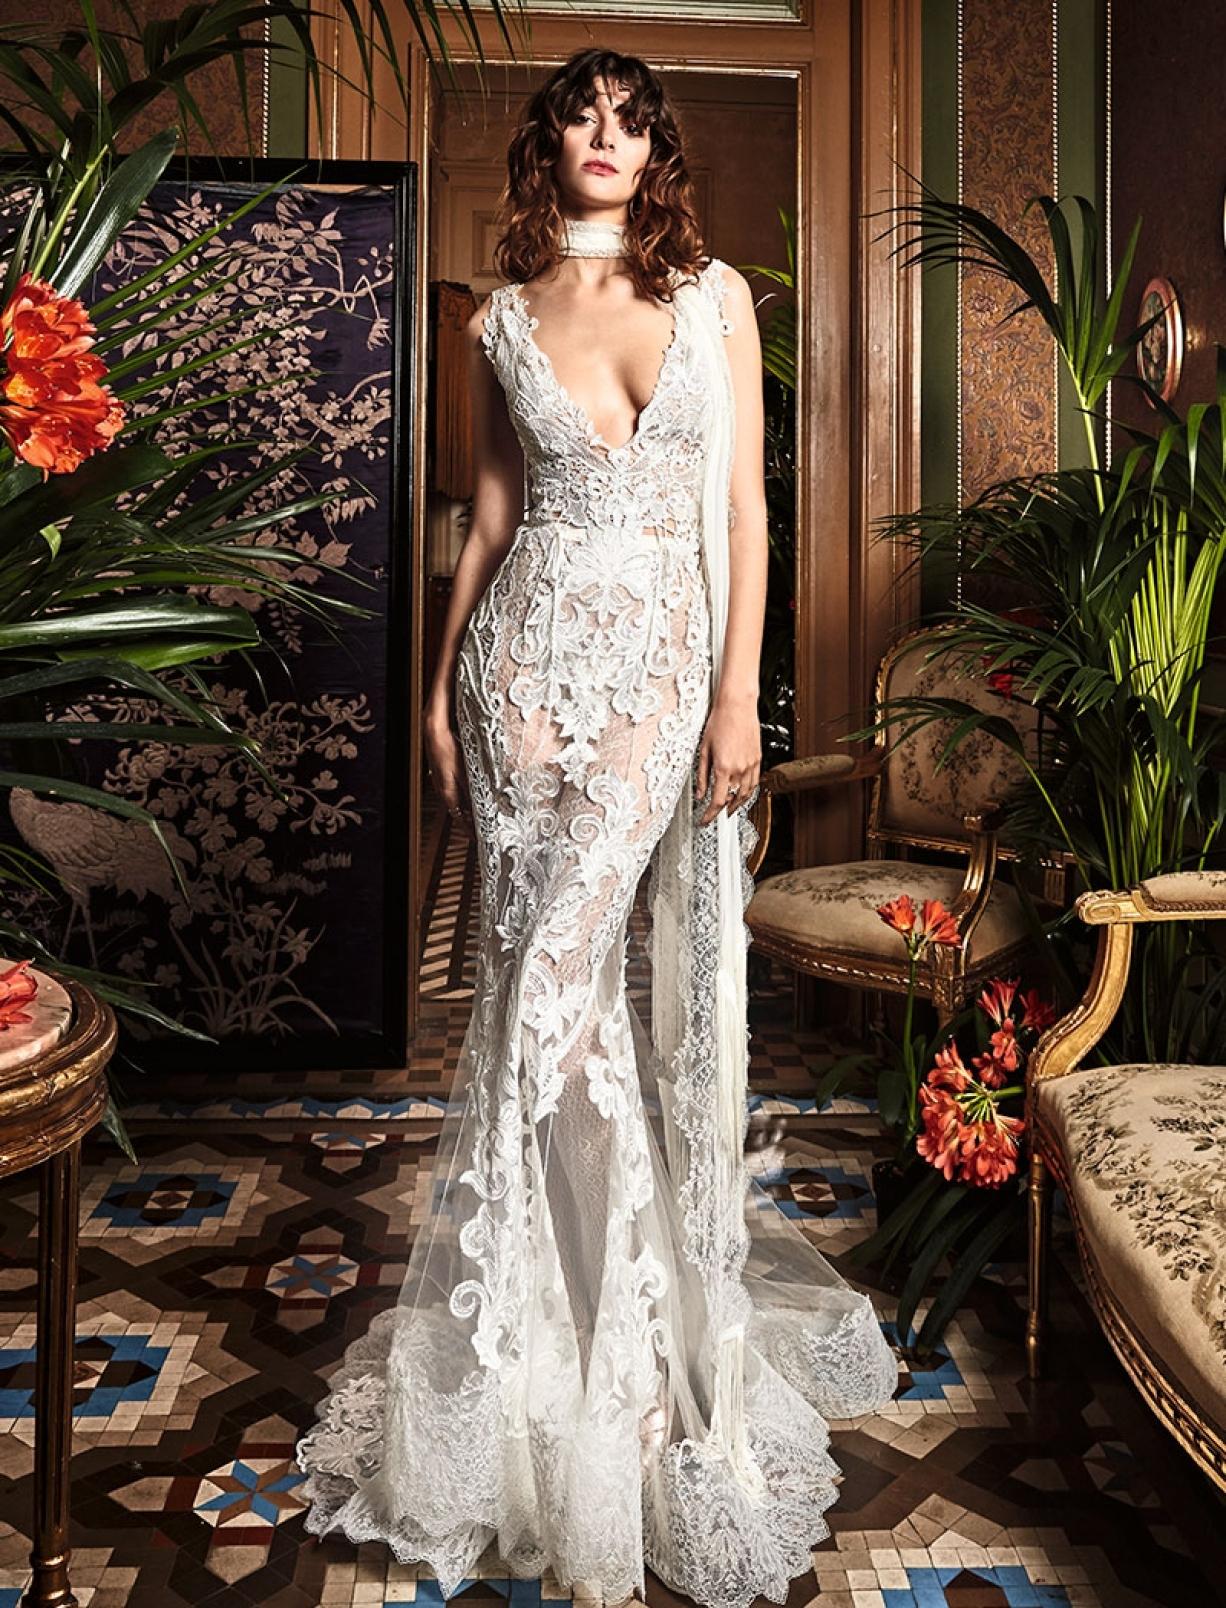 boho_chic_wedding_dresses_2017_bohemian_lace_wedding_dress_yolan_cris_chris_style_petunia.jpg